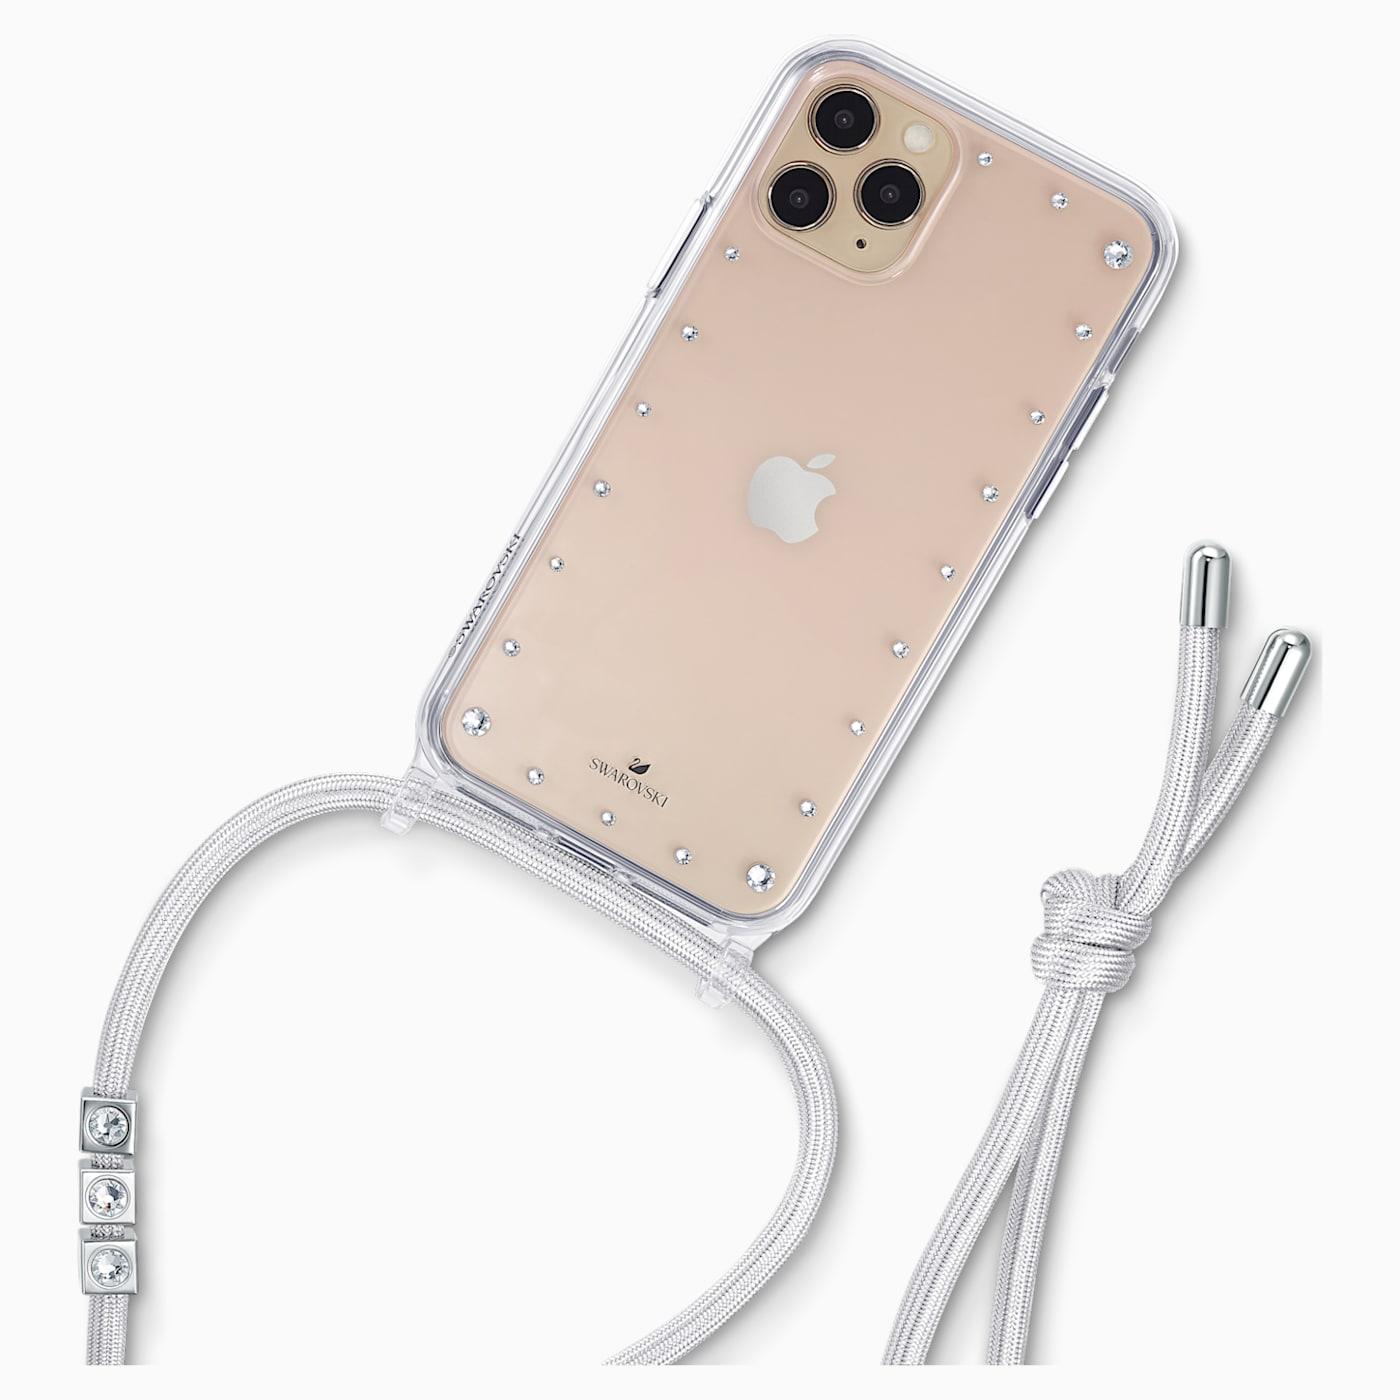 COLLIER ÉTUI POUR SMARTPHONE AVEC BUMPER SWAROVSKI, IPHONE® 11 PRO, BLANC, Swarovski